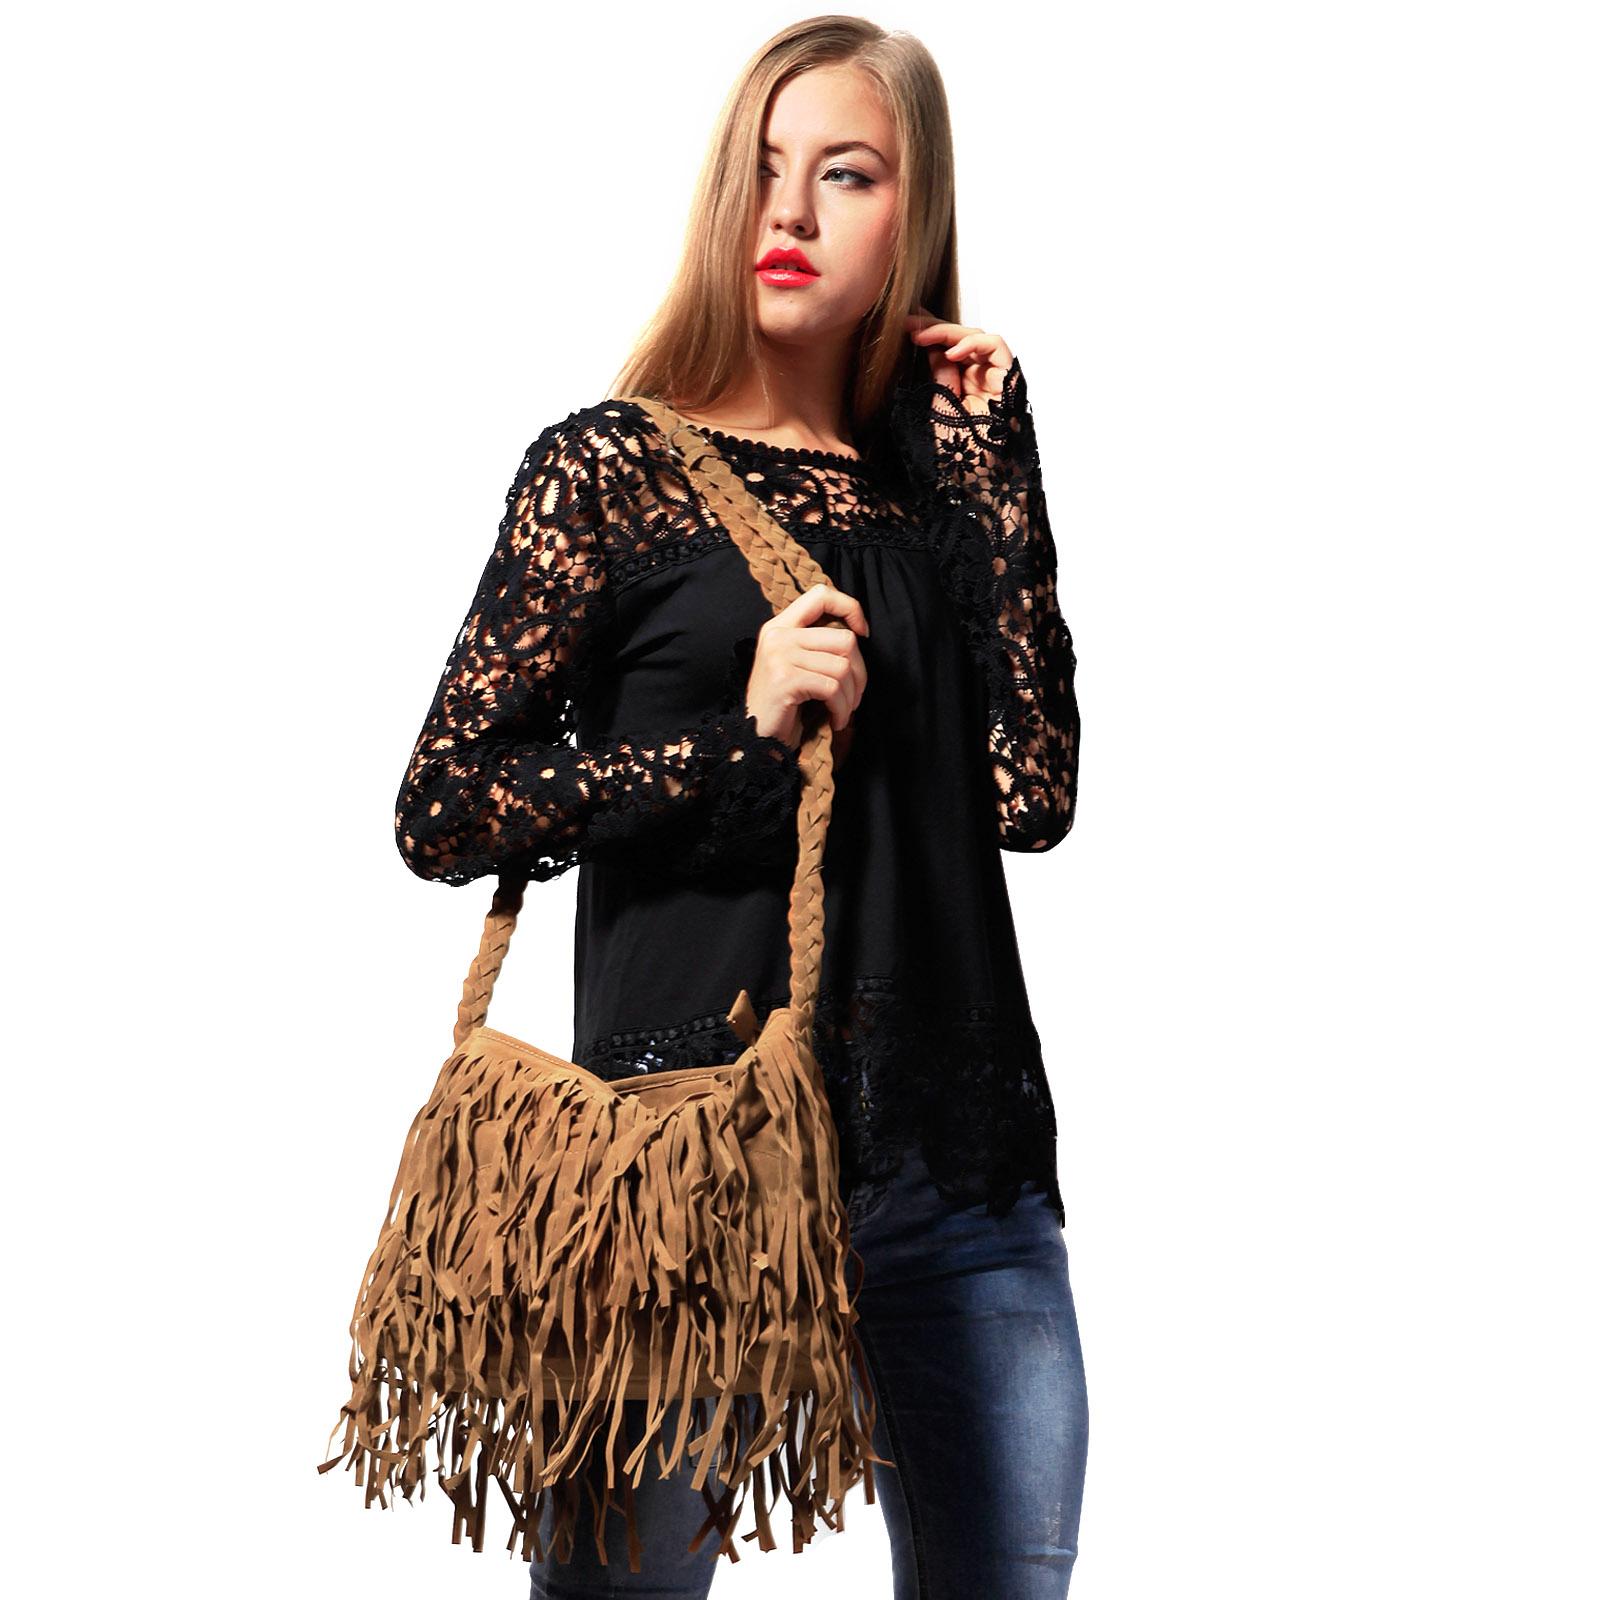 d458dea0b55c Vintage Women s Faux Suede Fringe Tassels Crossbody Bag Shoulder Bag Cross  Body